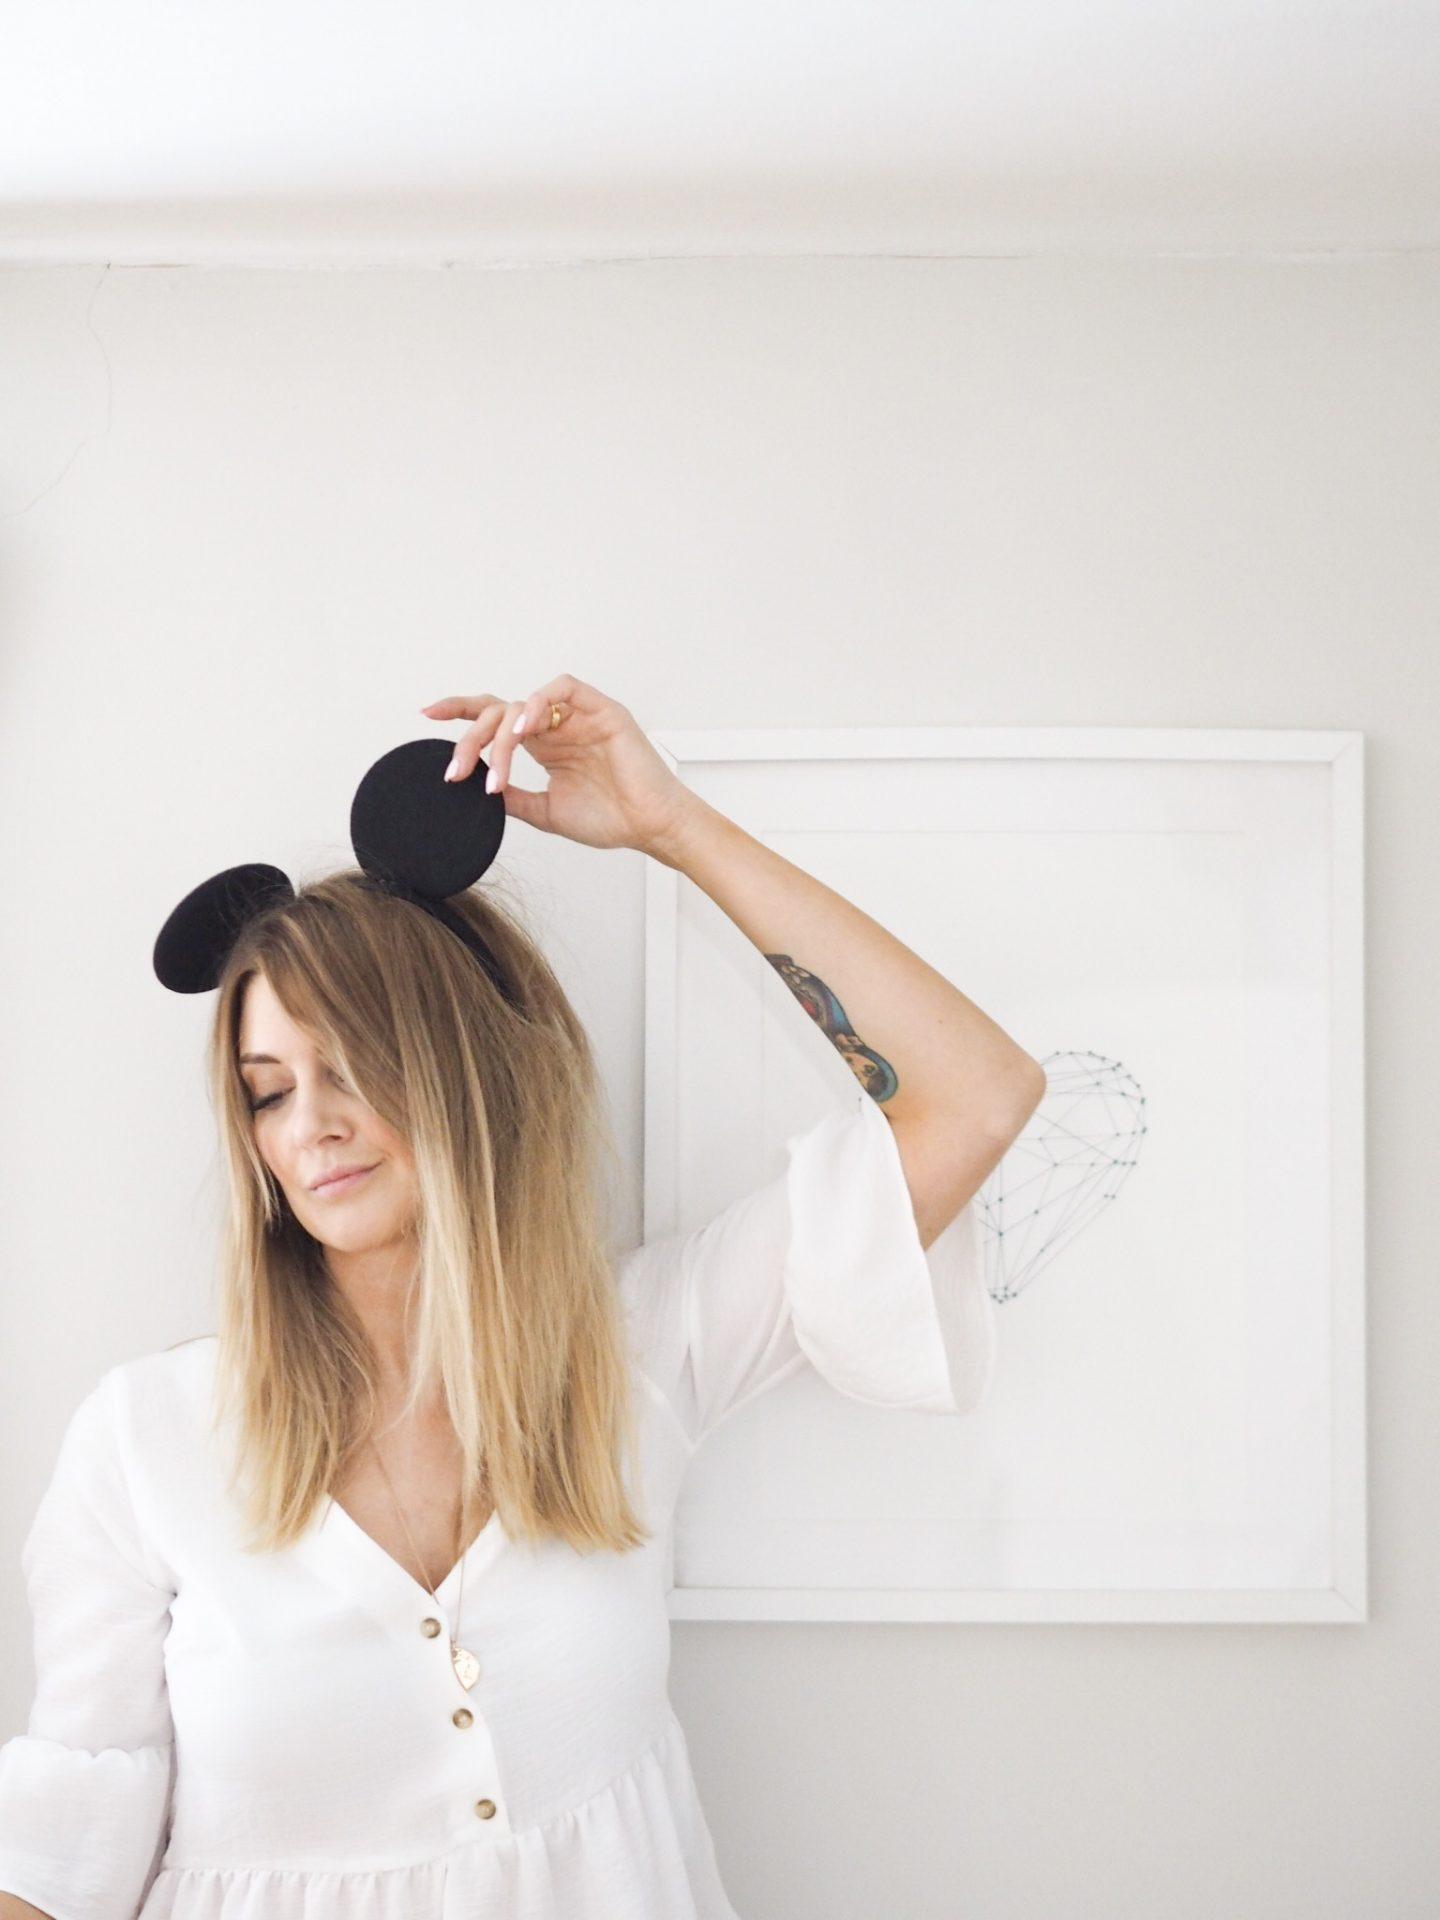 5 Reasons Why DisneyLand Is My Dream Holiday